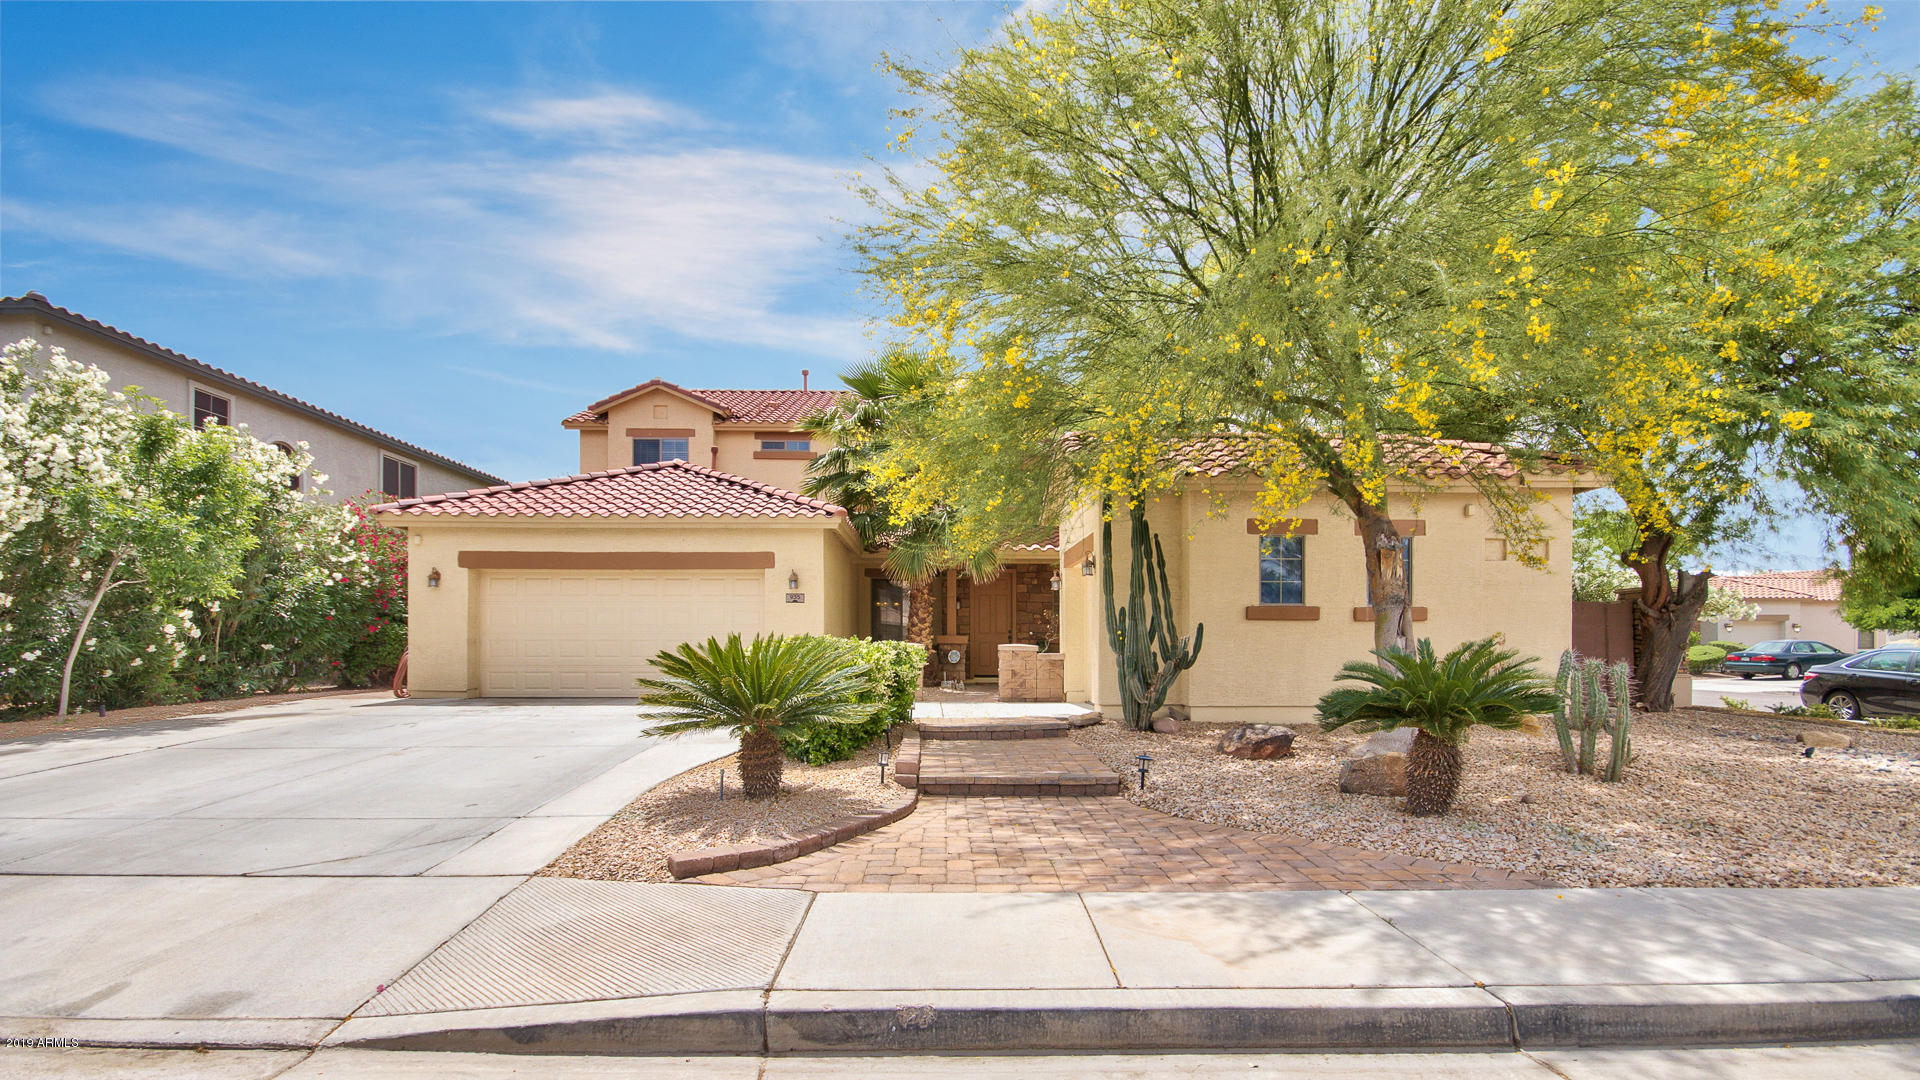 Photo of 935 W Whitten Street, Chandler, AZ 85225